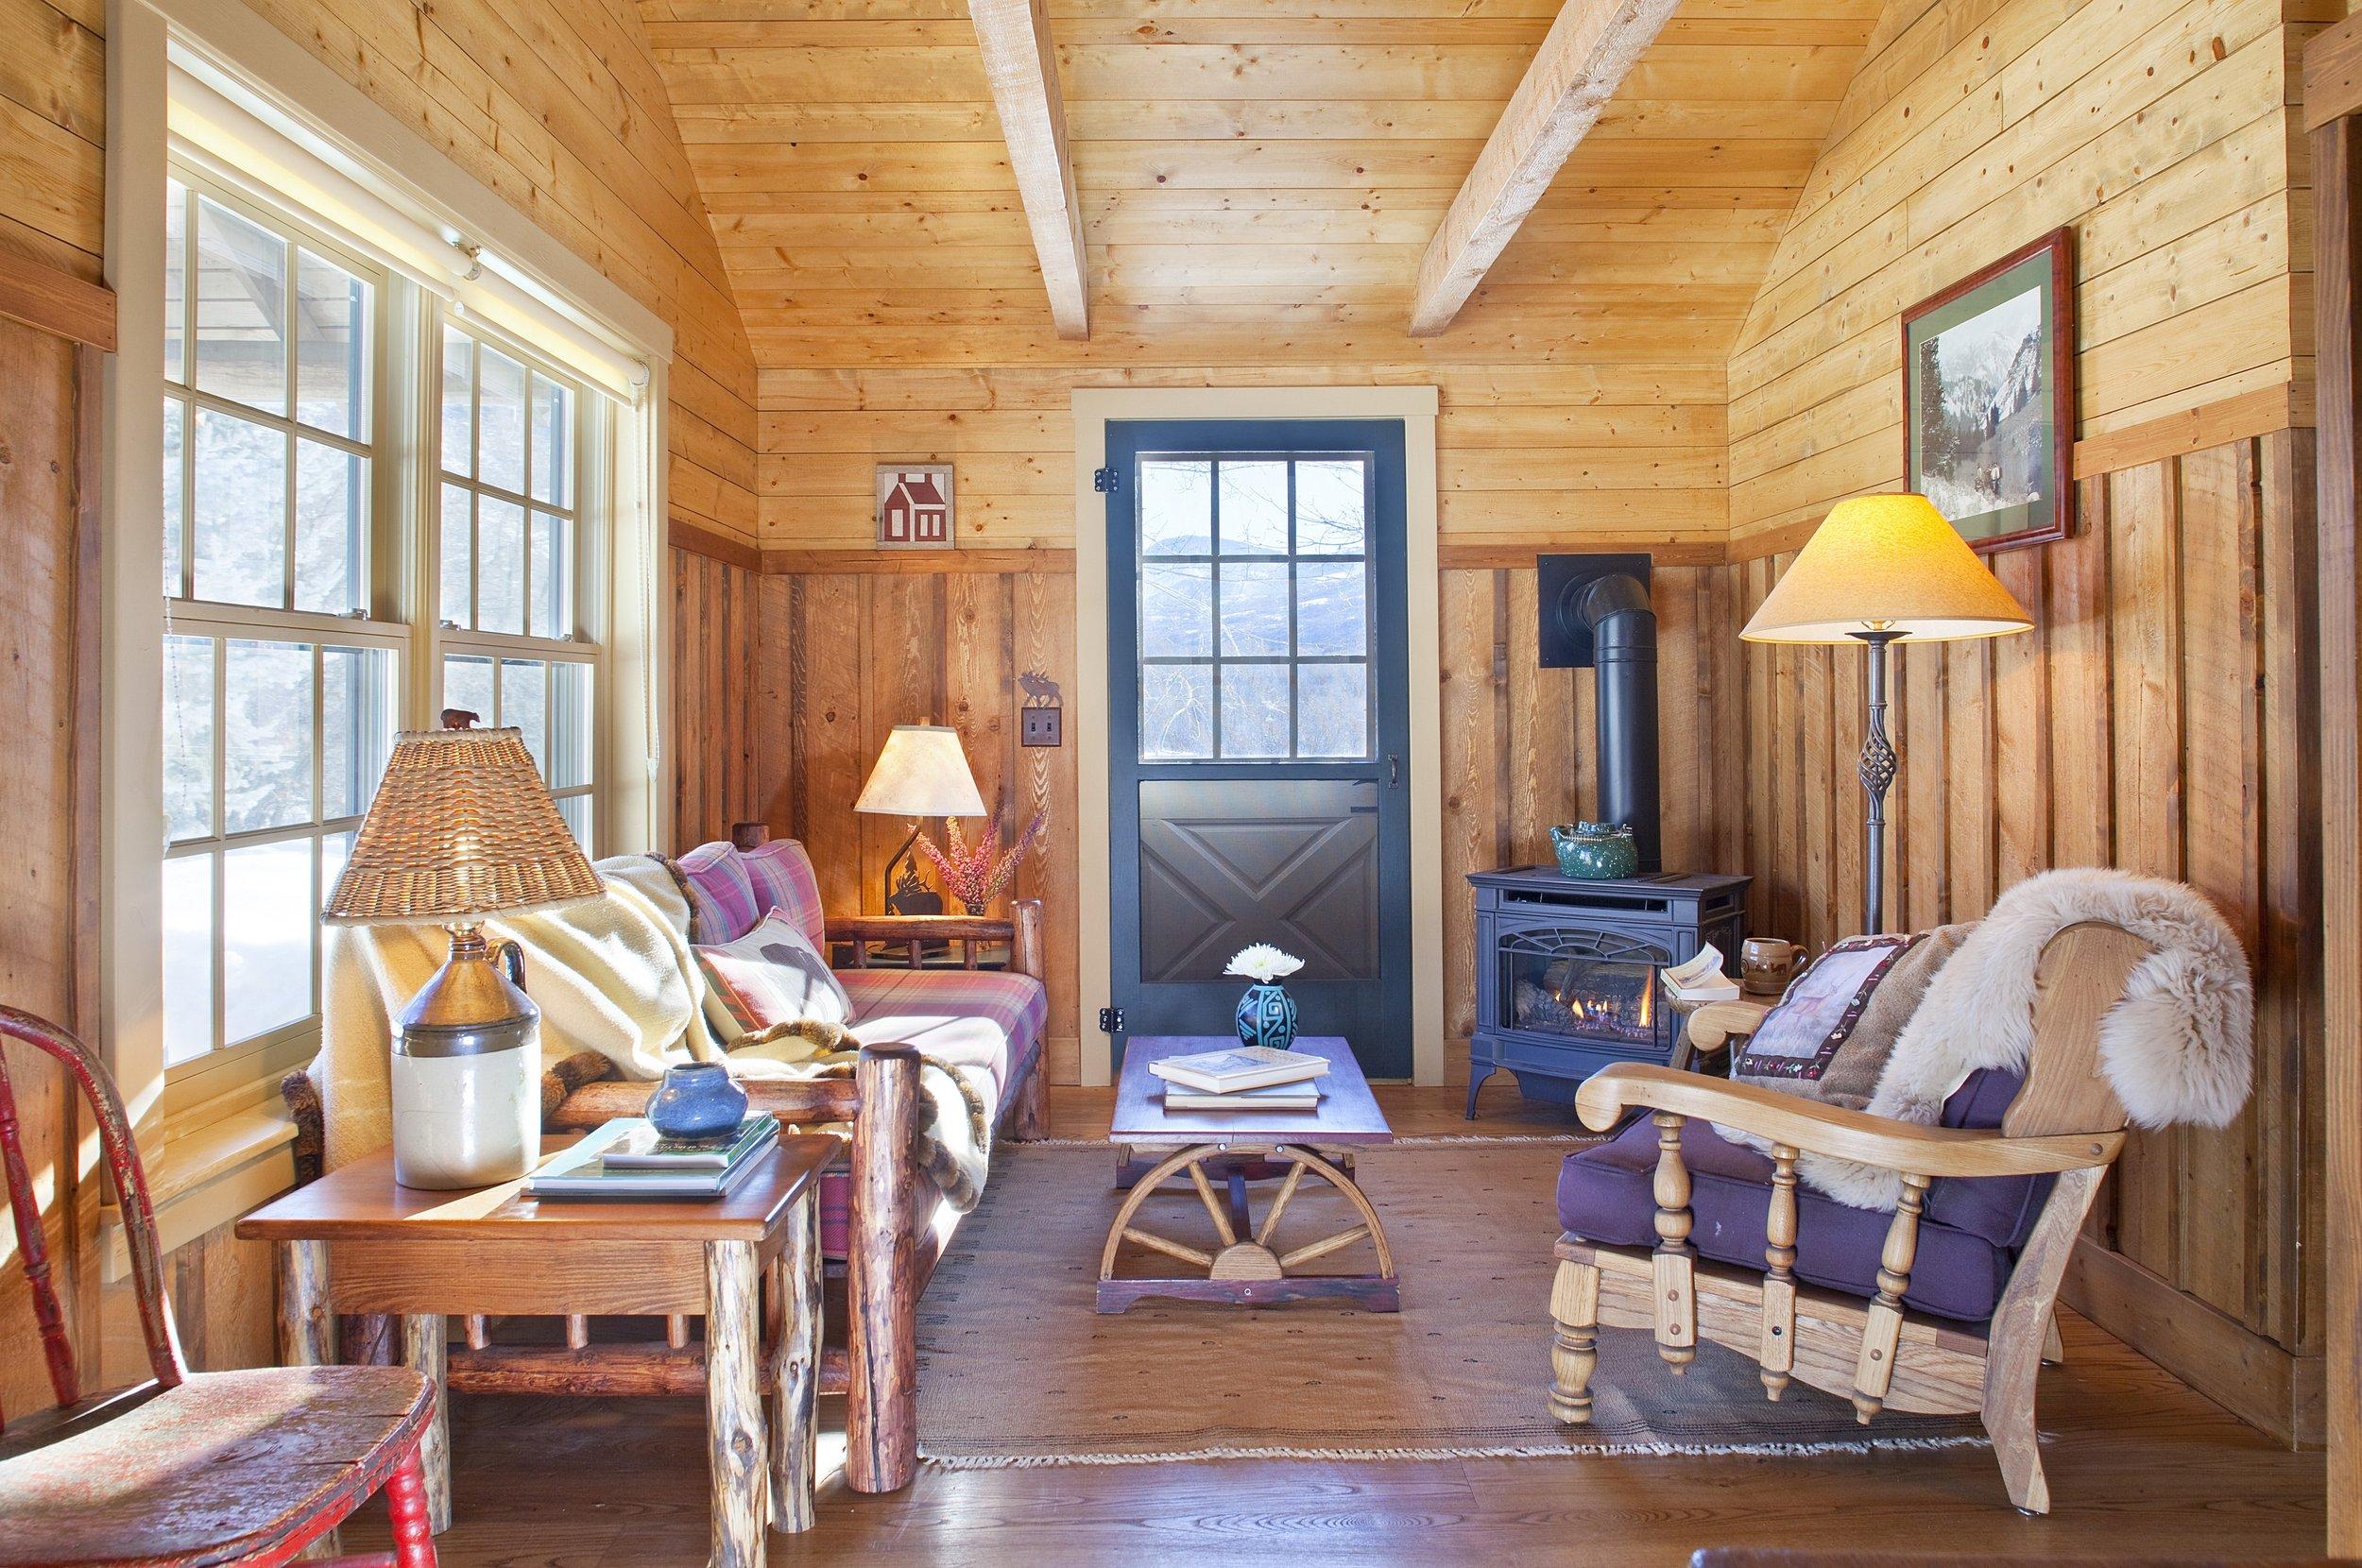 Oak Cabin - One of 3 Guest Cabins